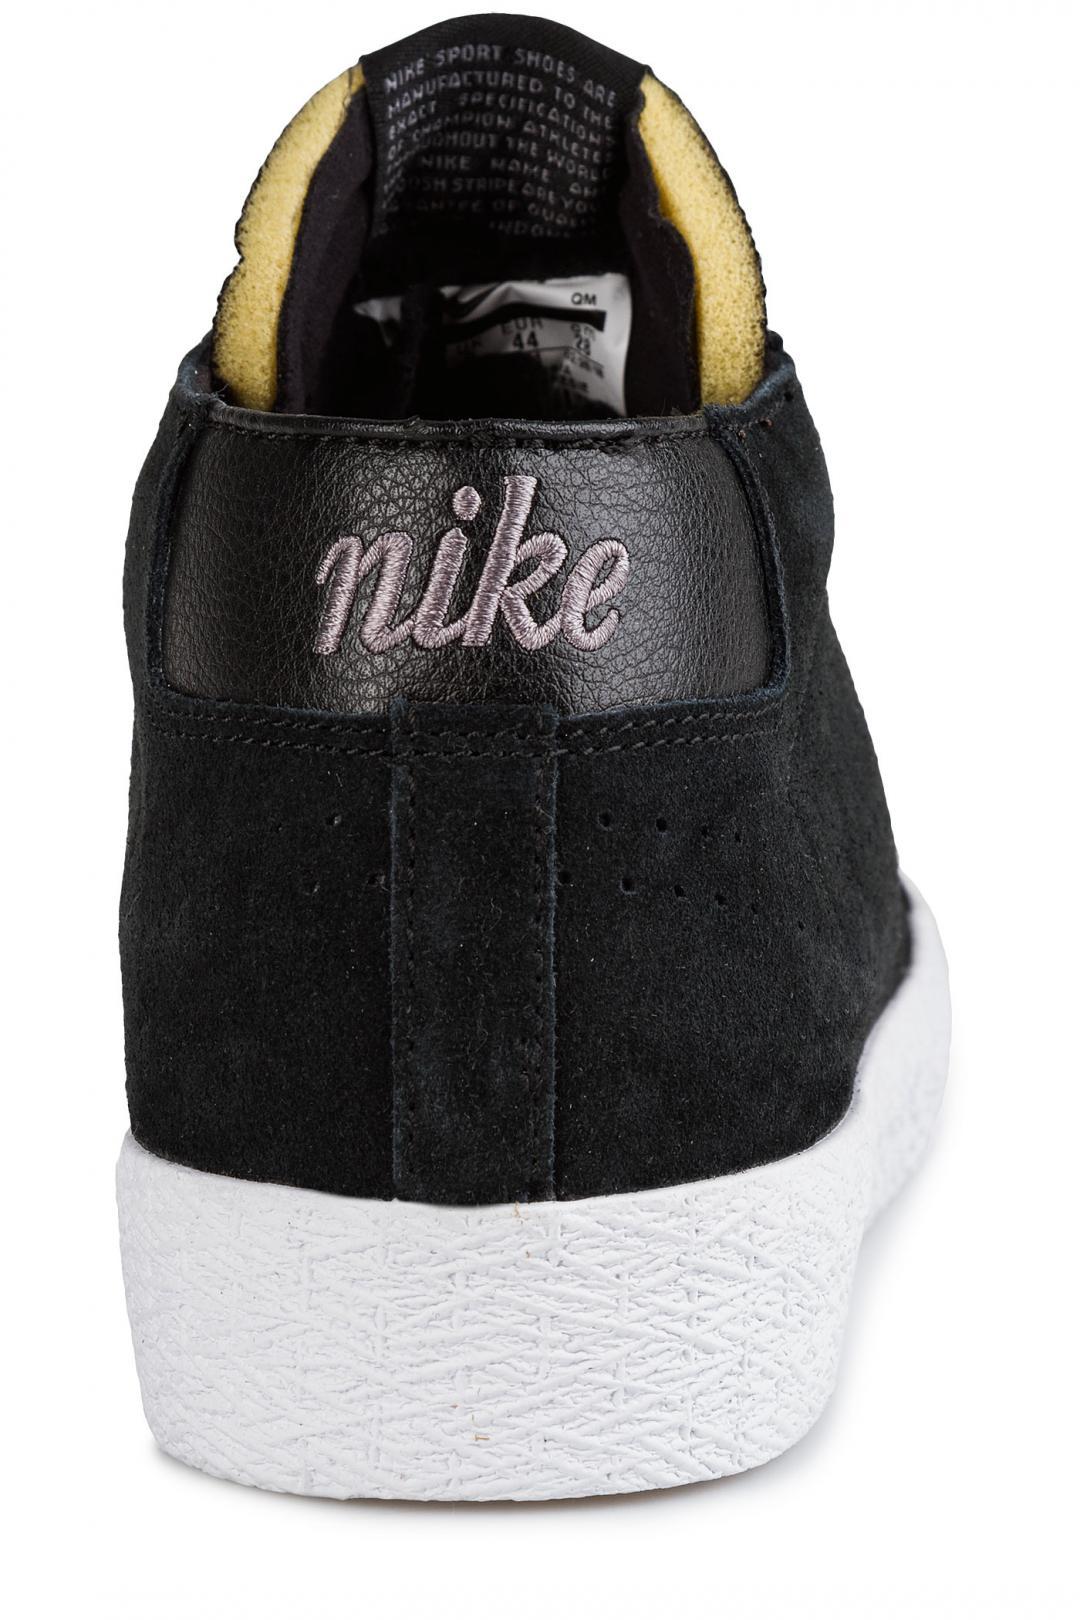 Uomo Nike SB Zoom Blazer Chukka XT black black gunsmoke | Sneakers mid top